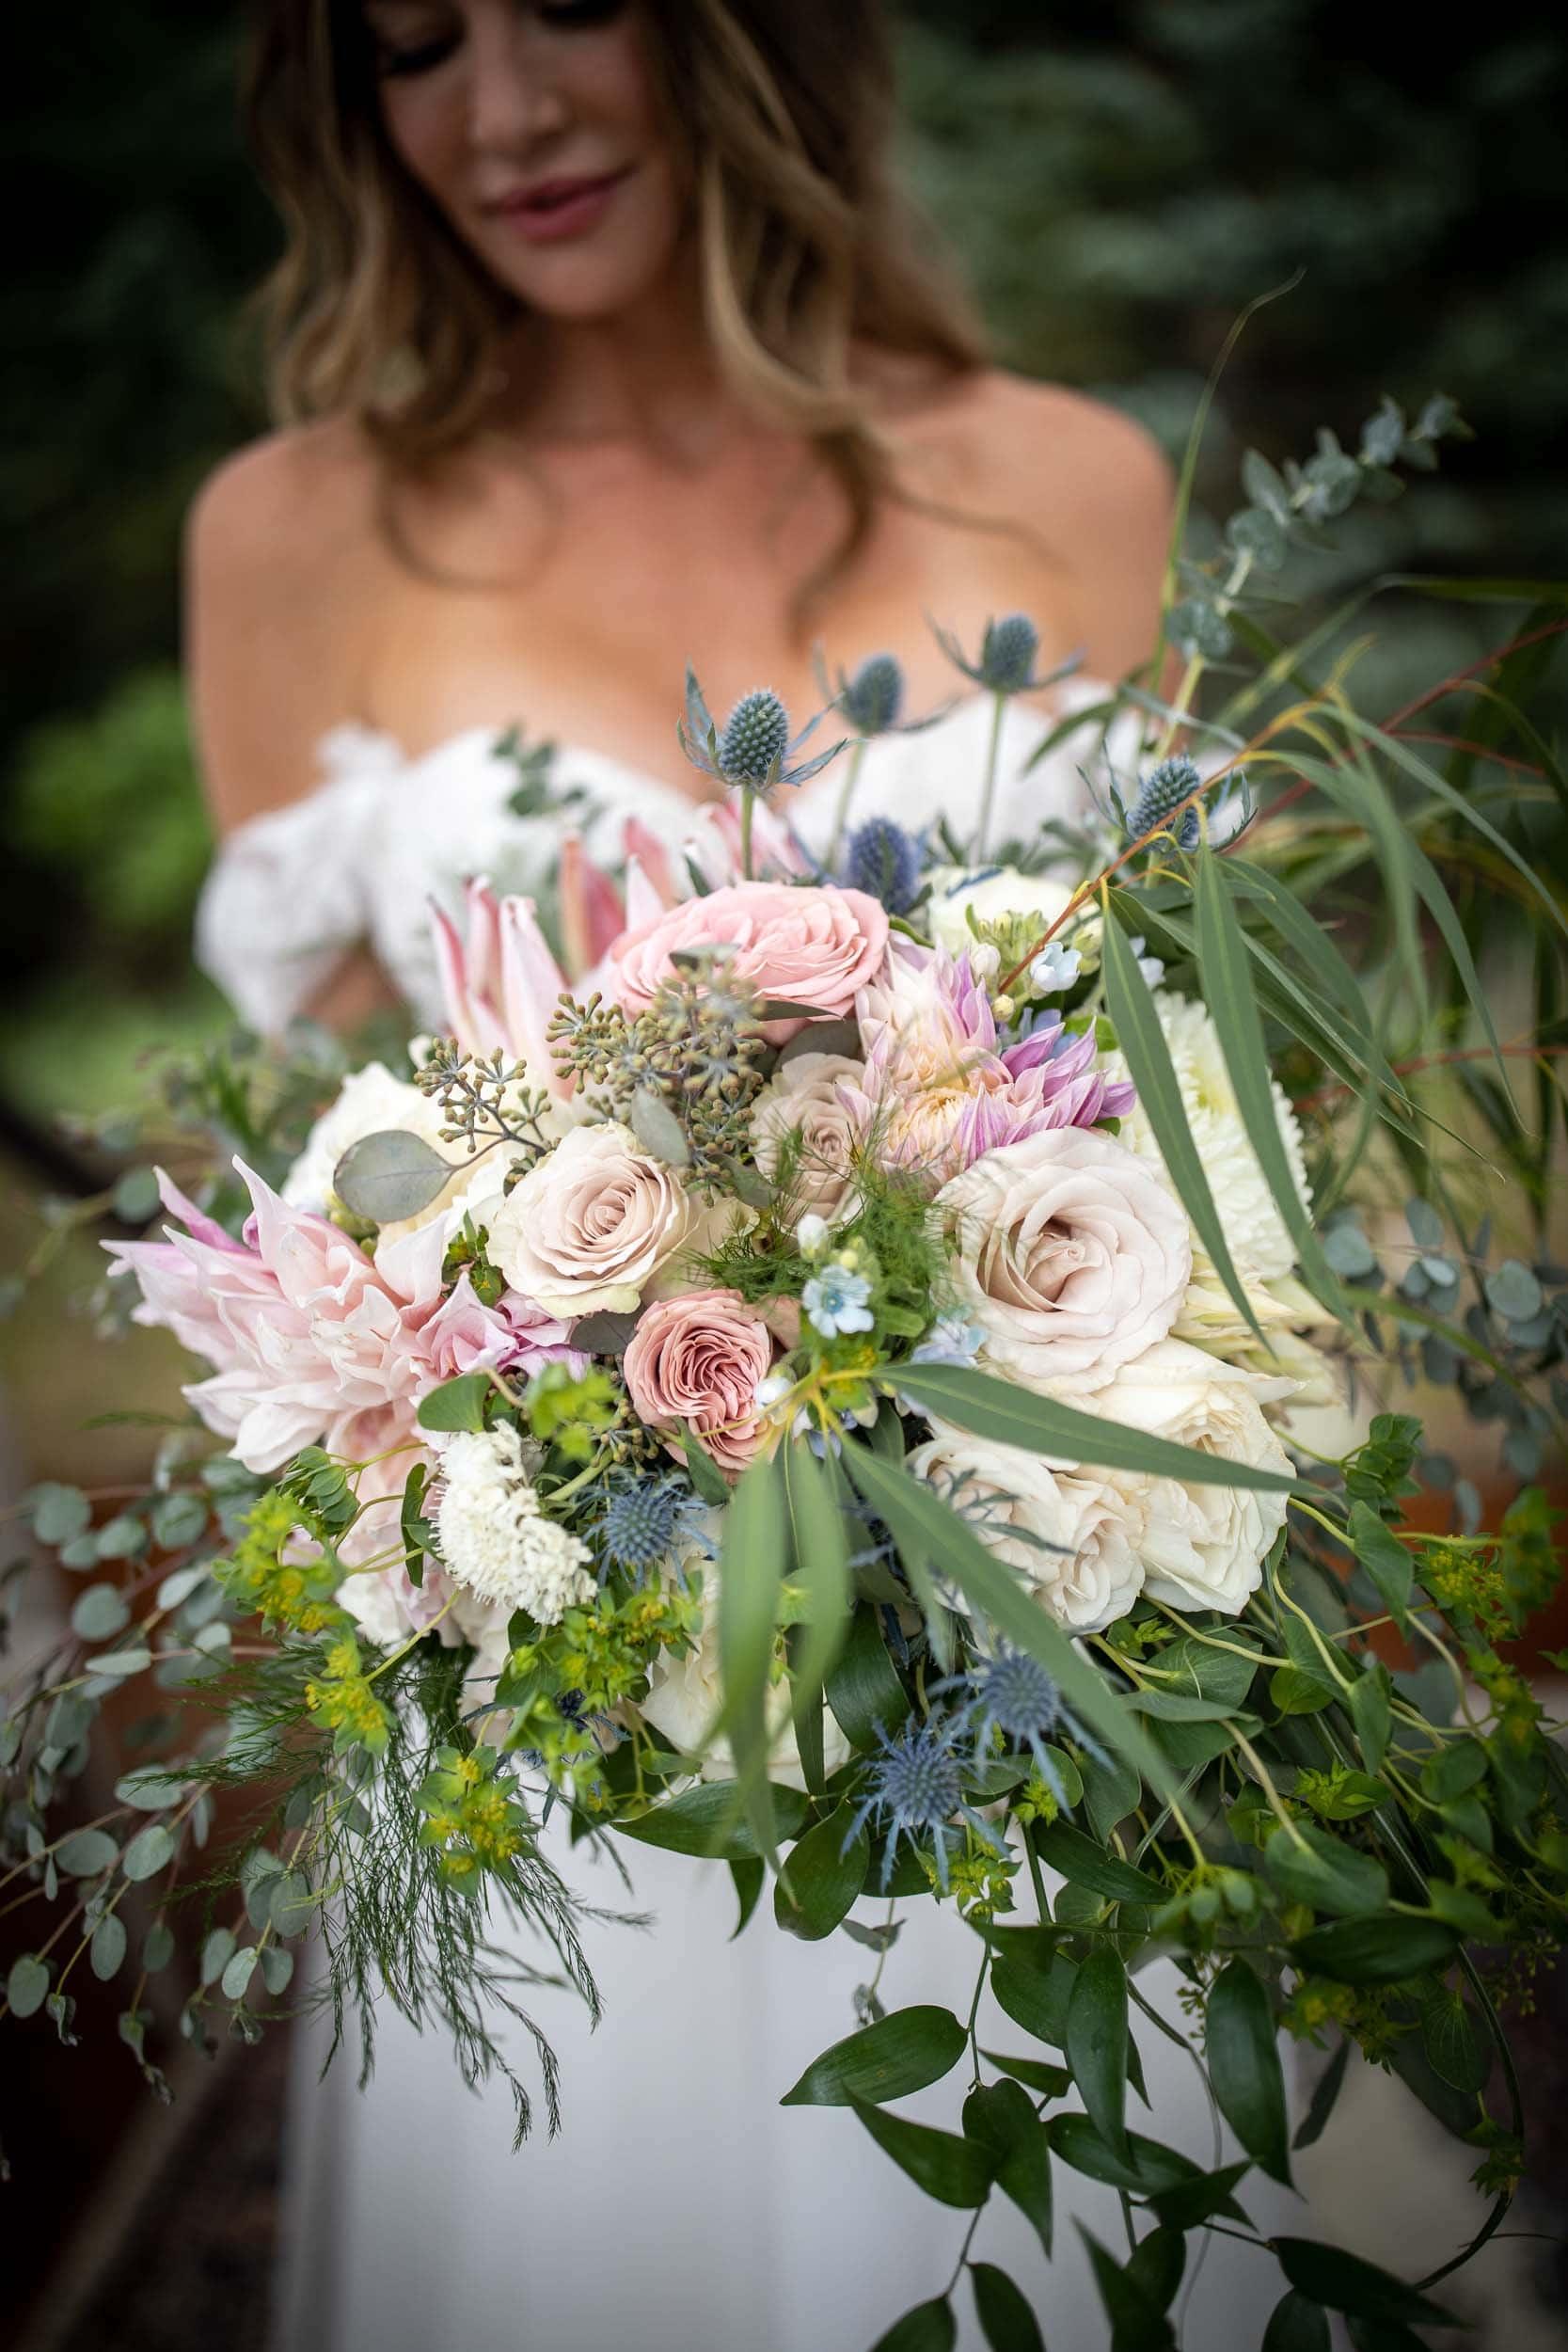 brides bouquet from Aprils Garden in Durango, CO